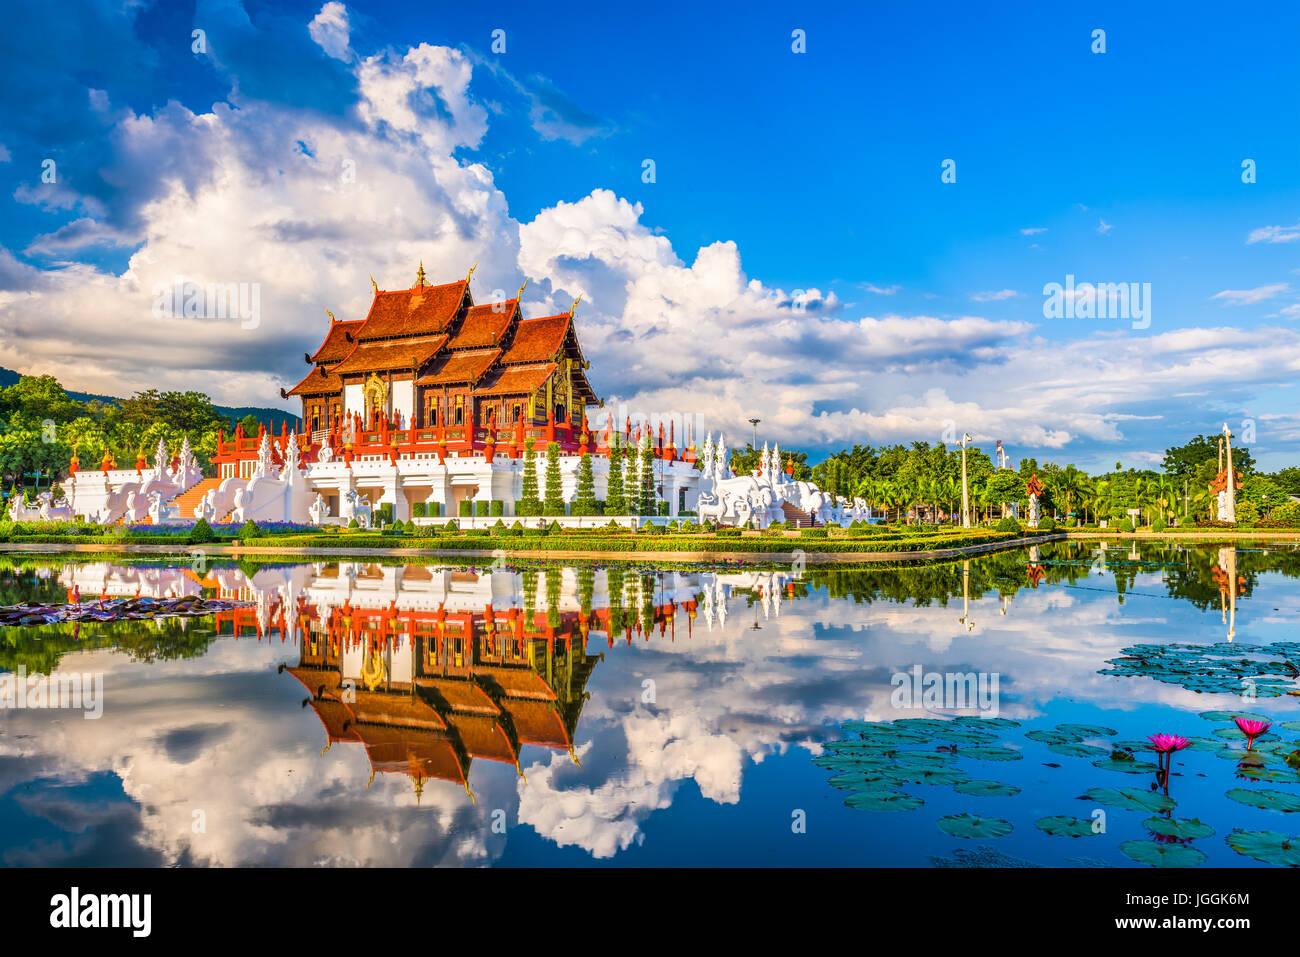 Chiang Mai, Thailandia presso il Royal Ratchaphruek Flora Park. Immagini Stock